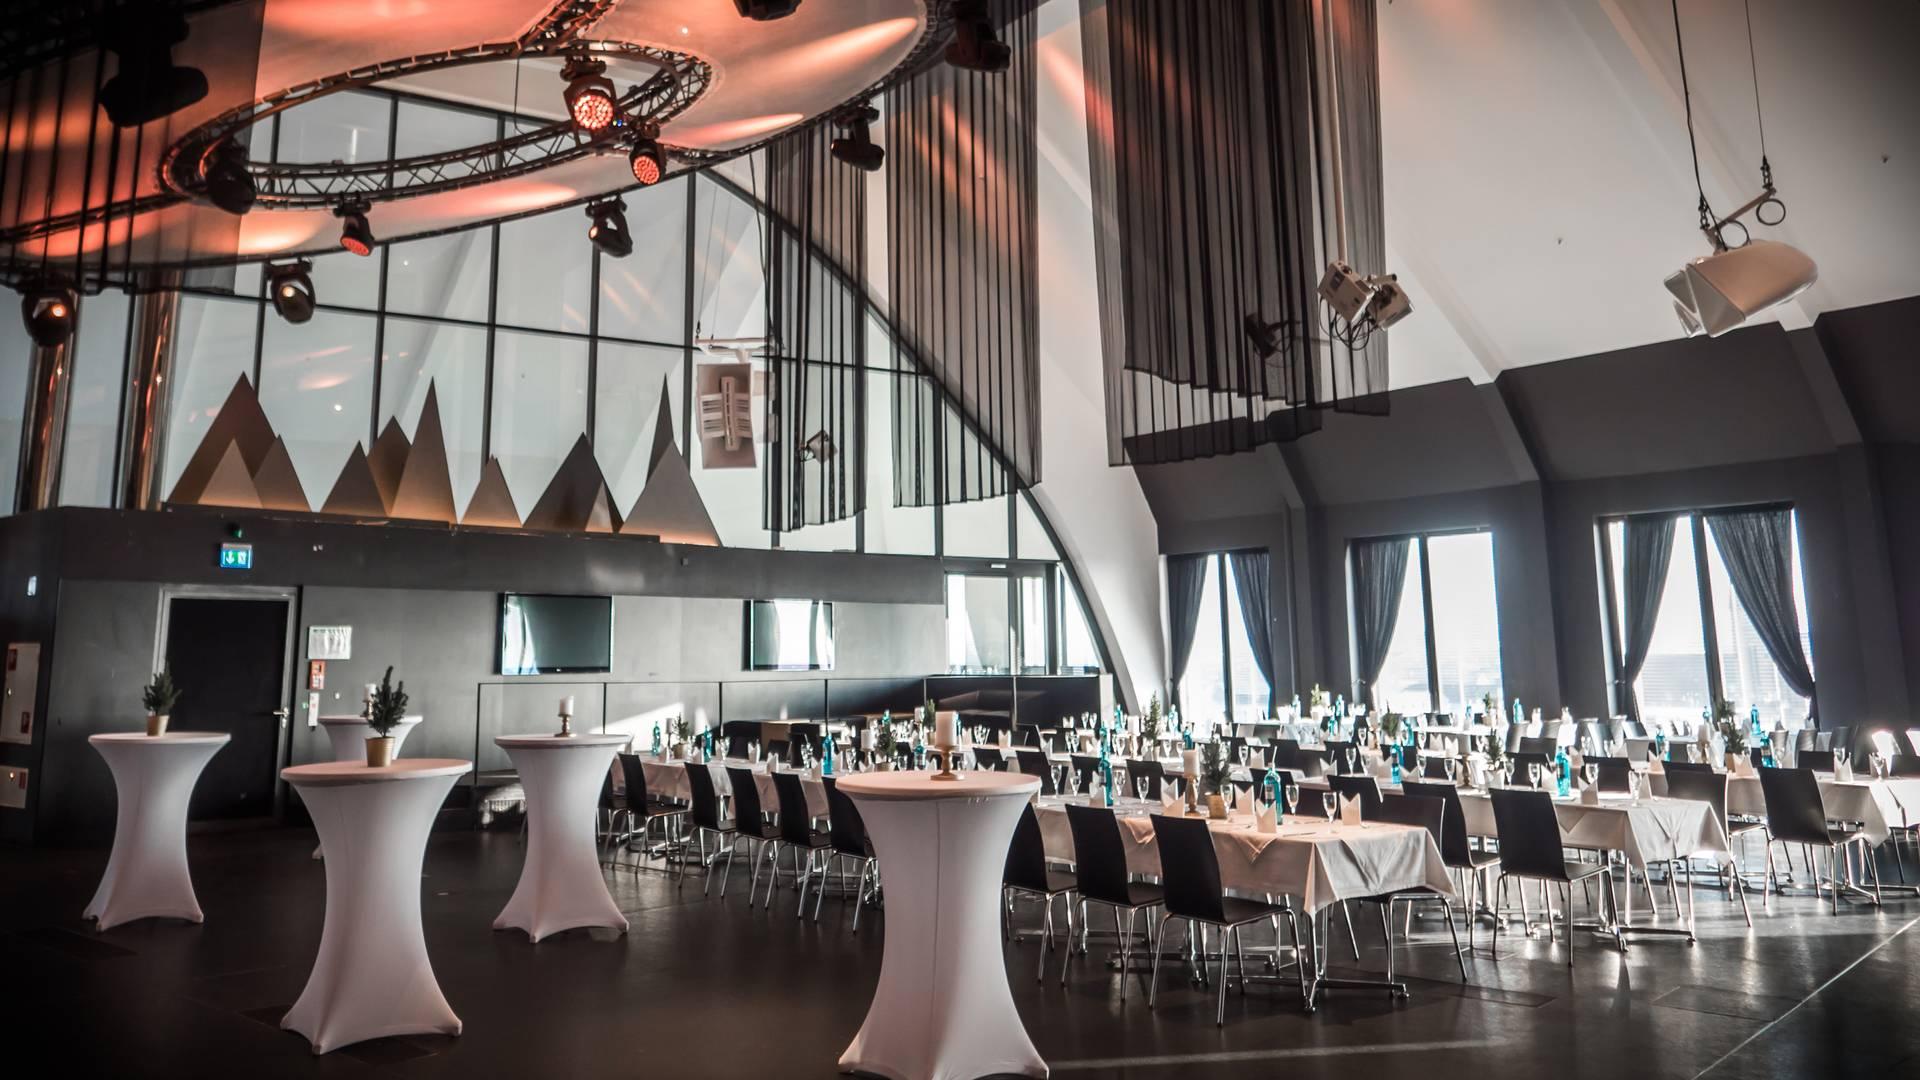 ᐅ VIEW im Dortmunder U ⇒ Veranstaltungsräume